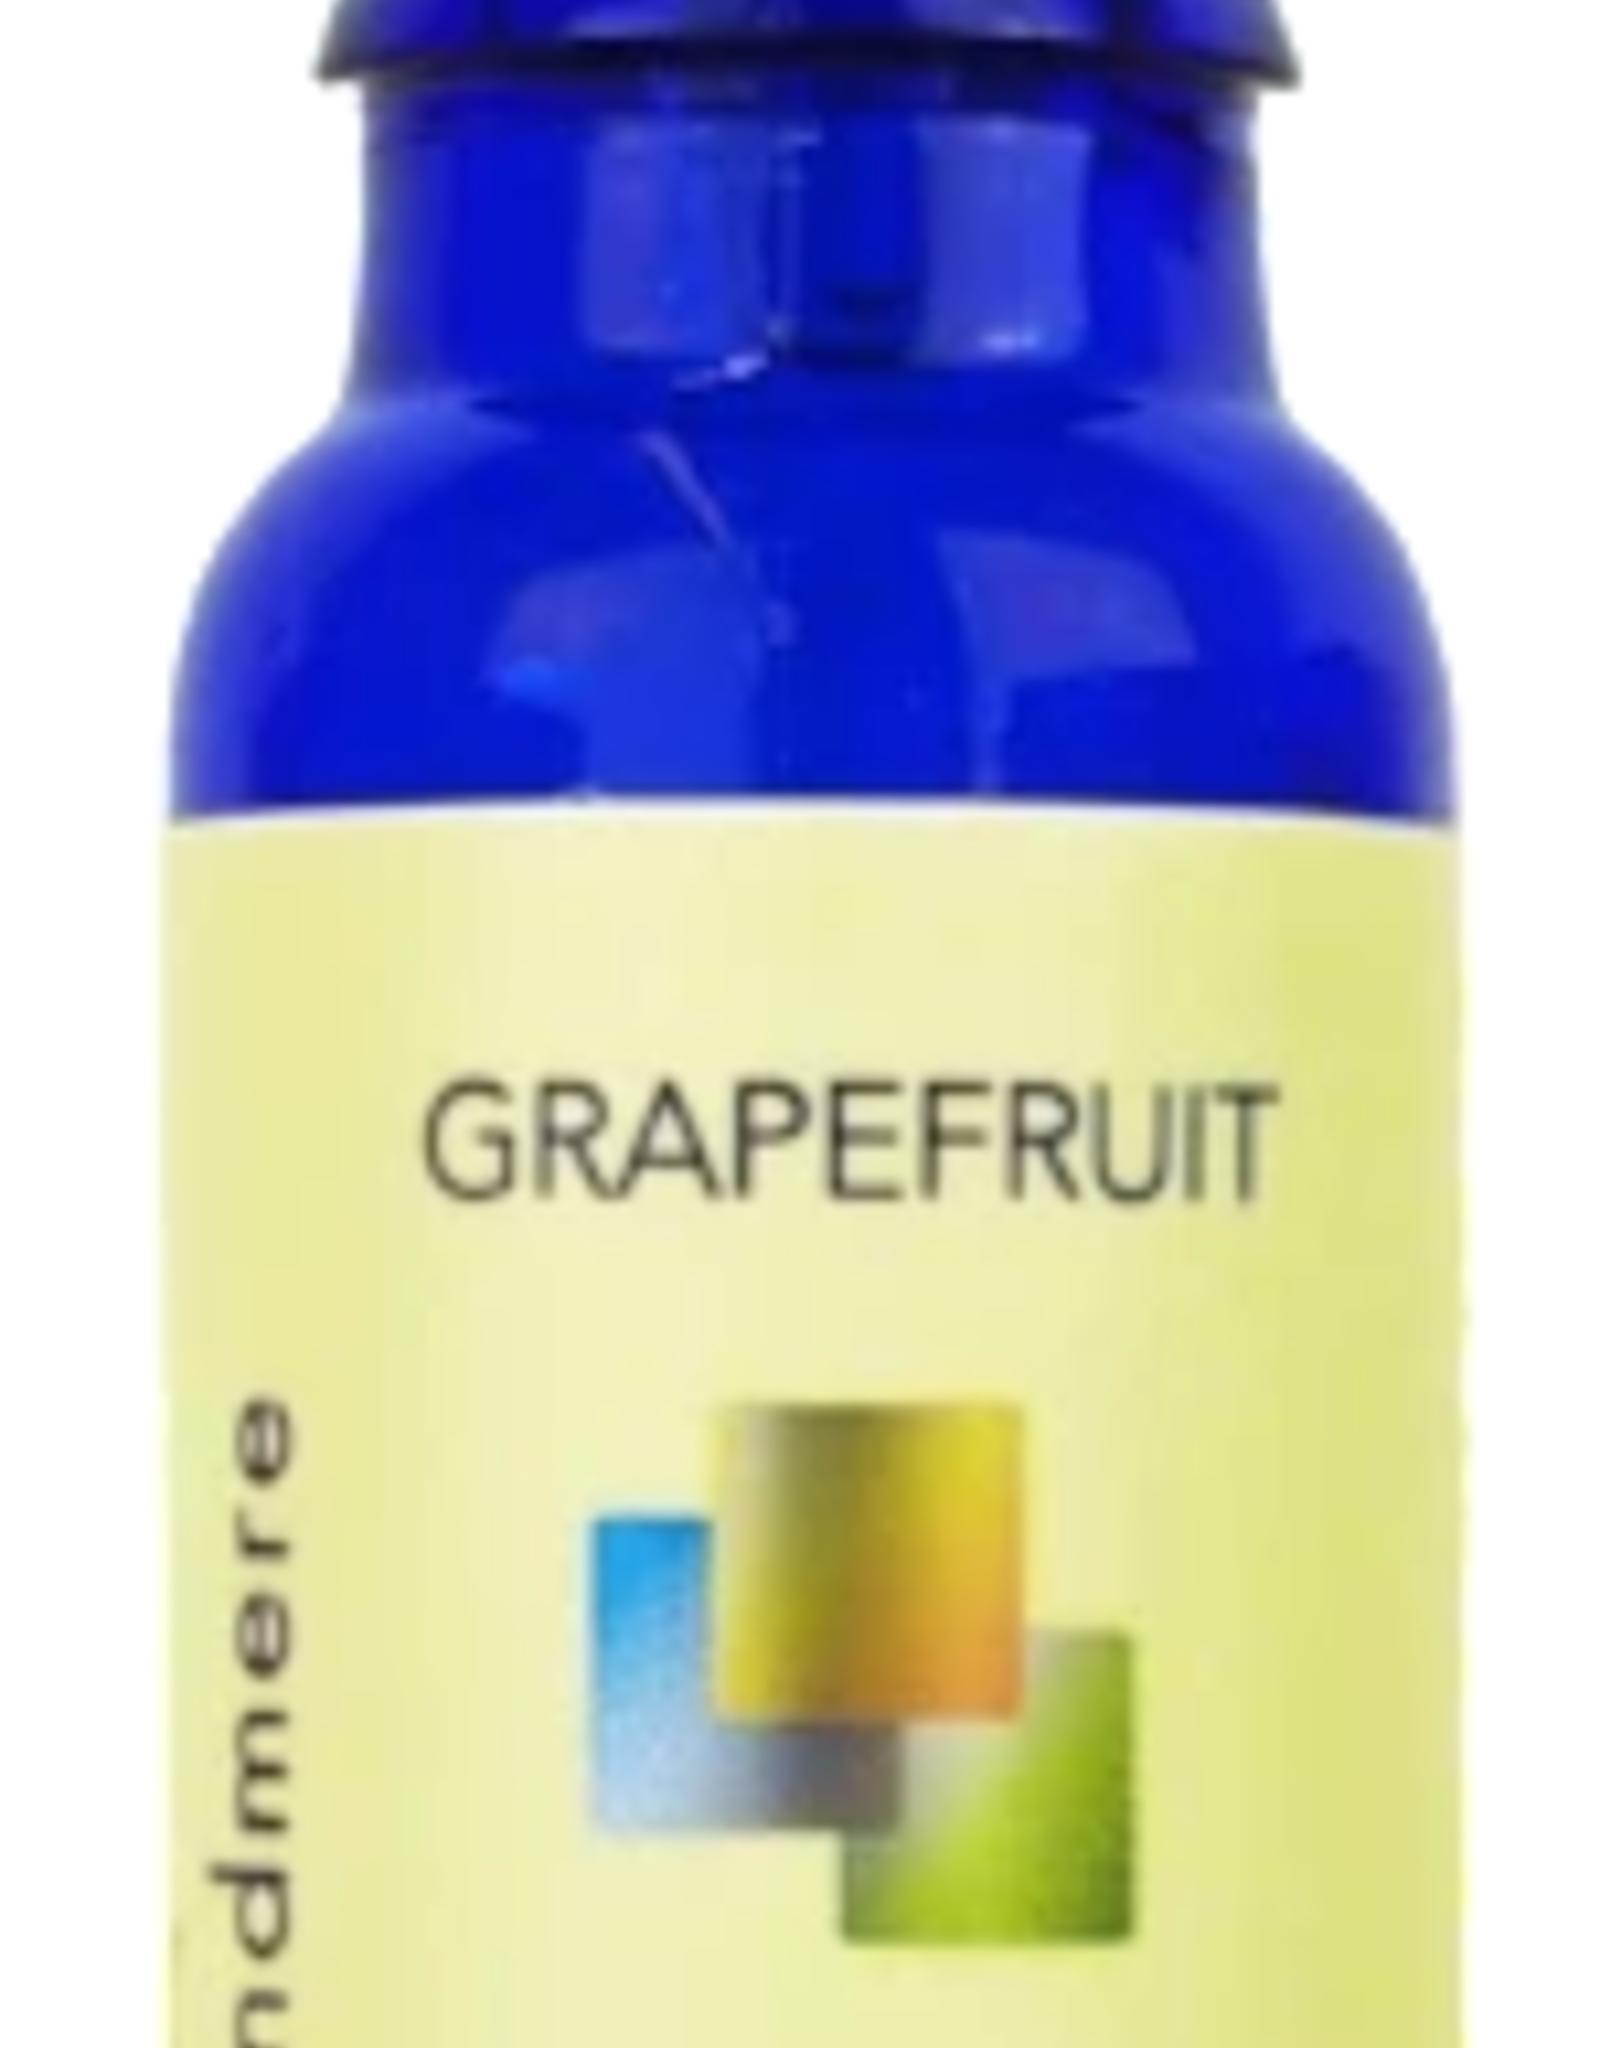 Wyndmere OIL Grapefruit 10ml Dripcap 100% WYN